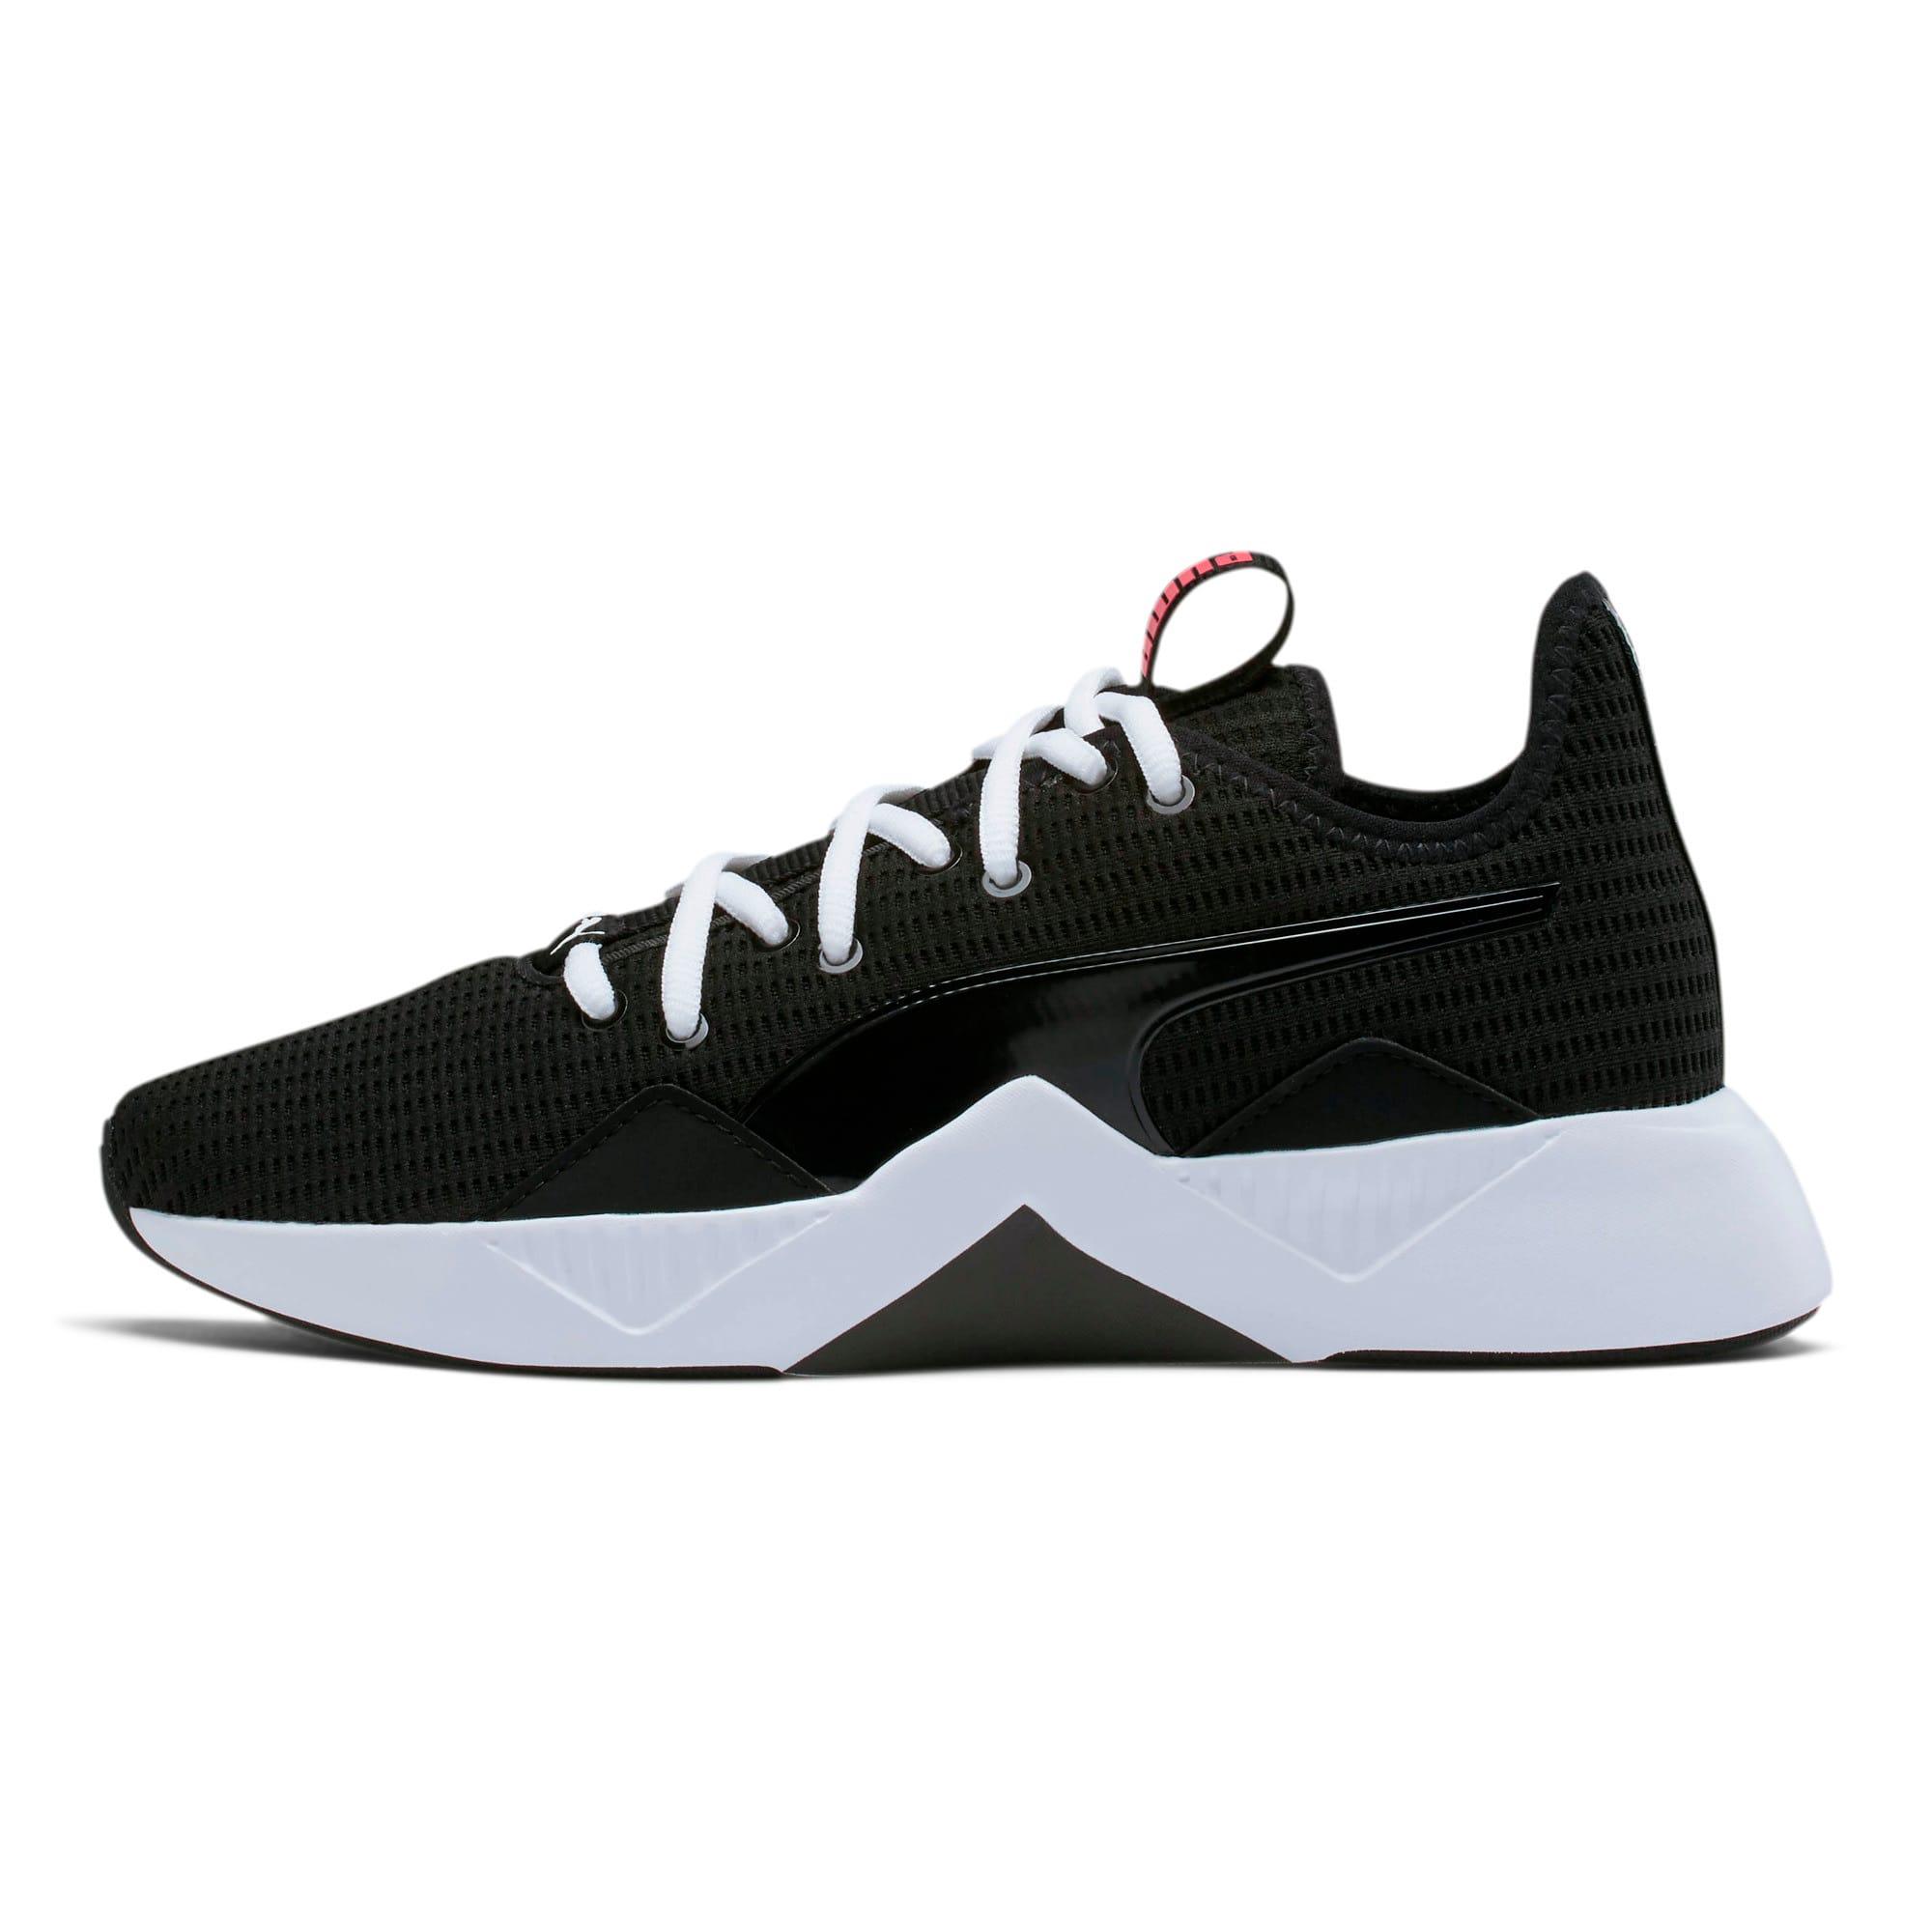 Thumbnail 1 of Incite FS Shift Women's Training Shoes, Puma Black-Nrgy Rose, medium